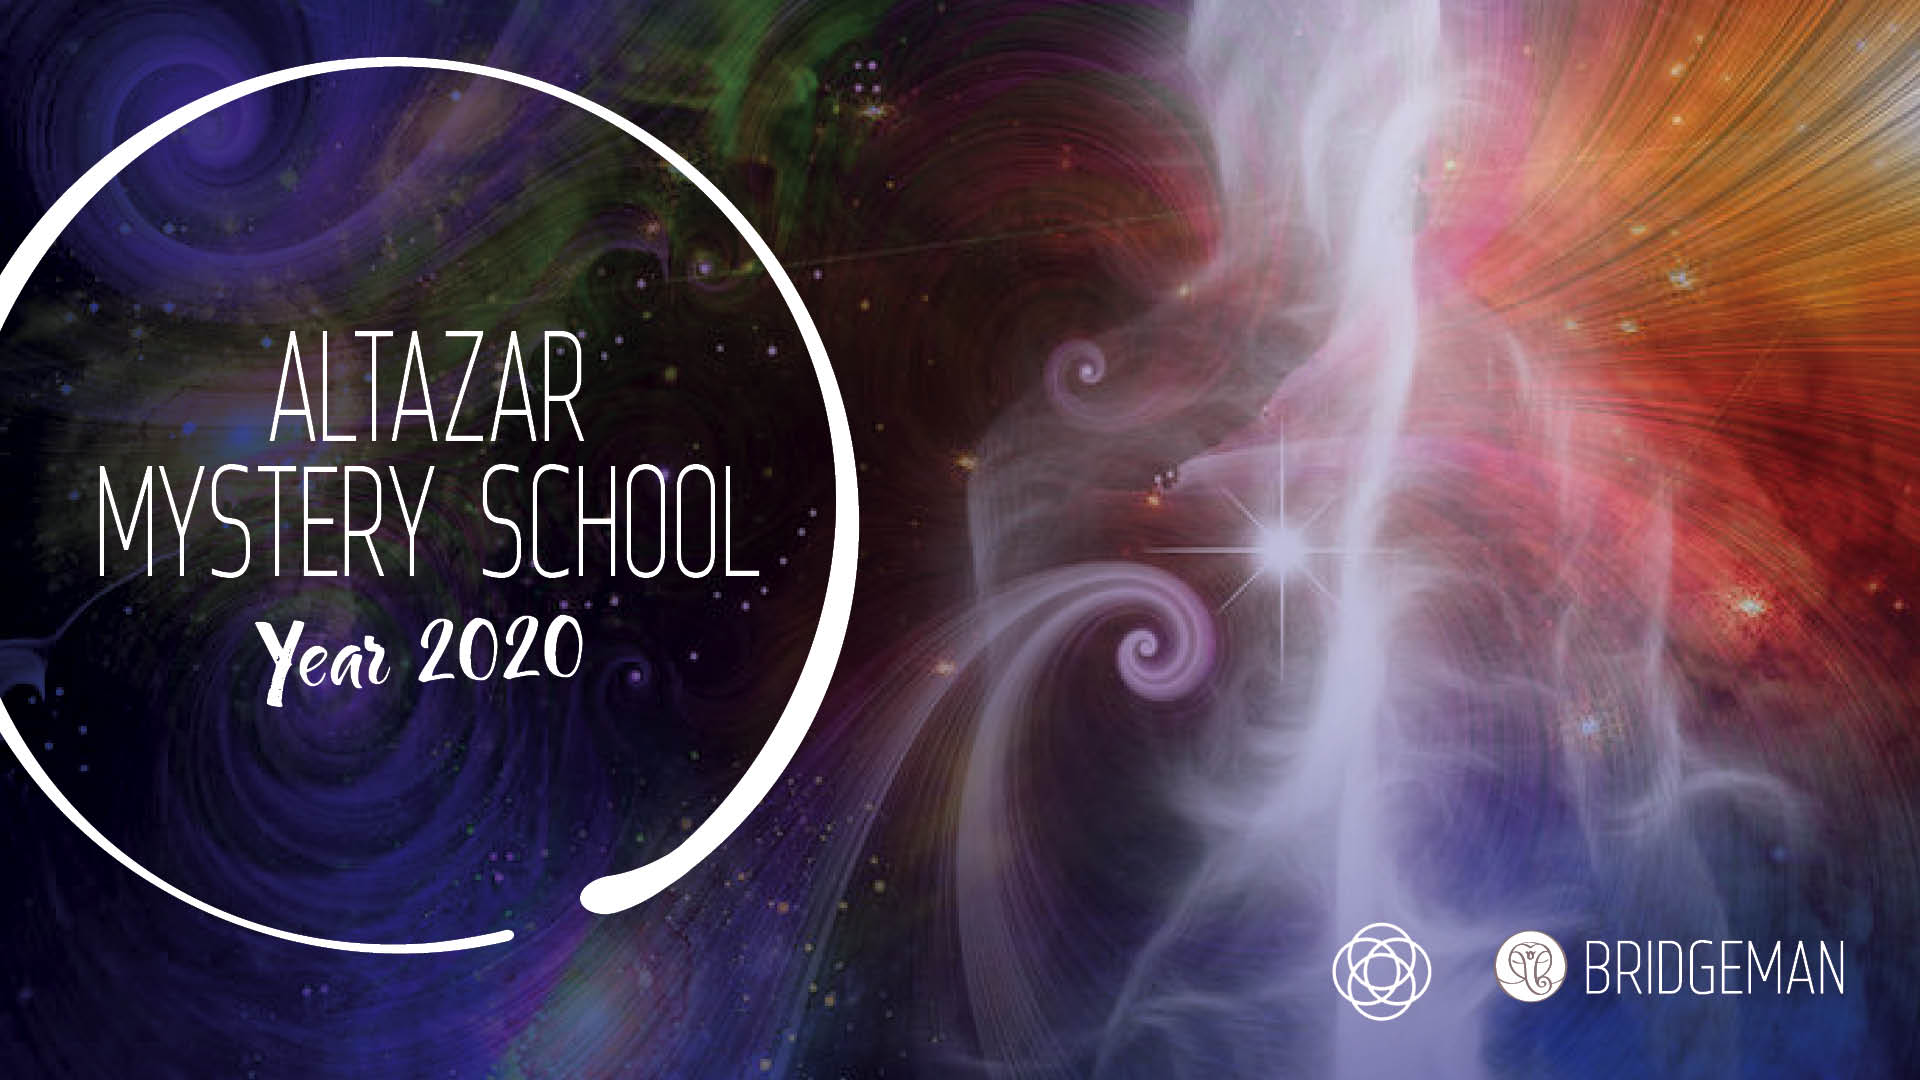 Altazar Mystery School